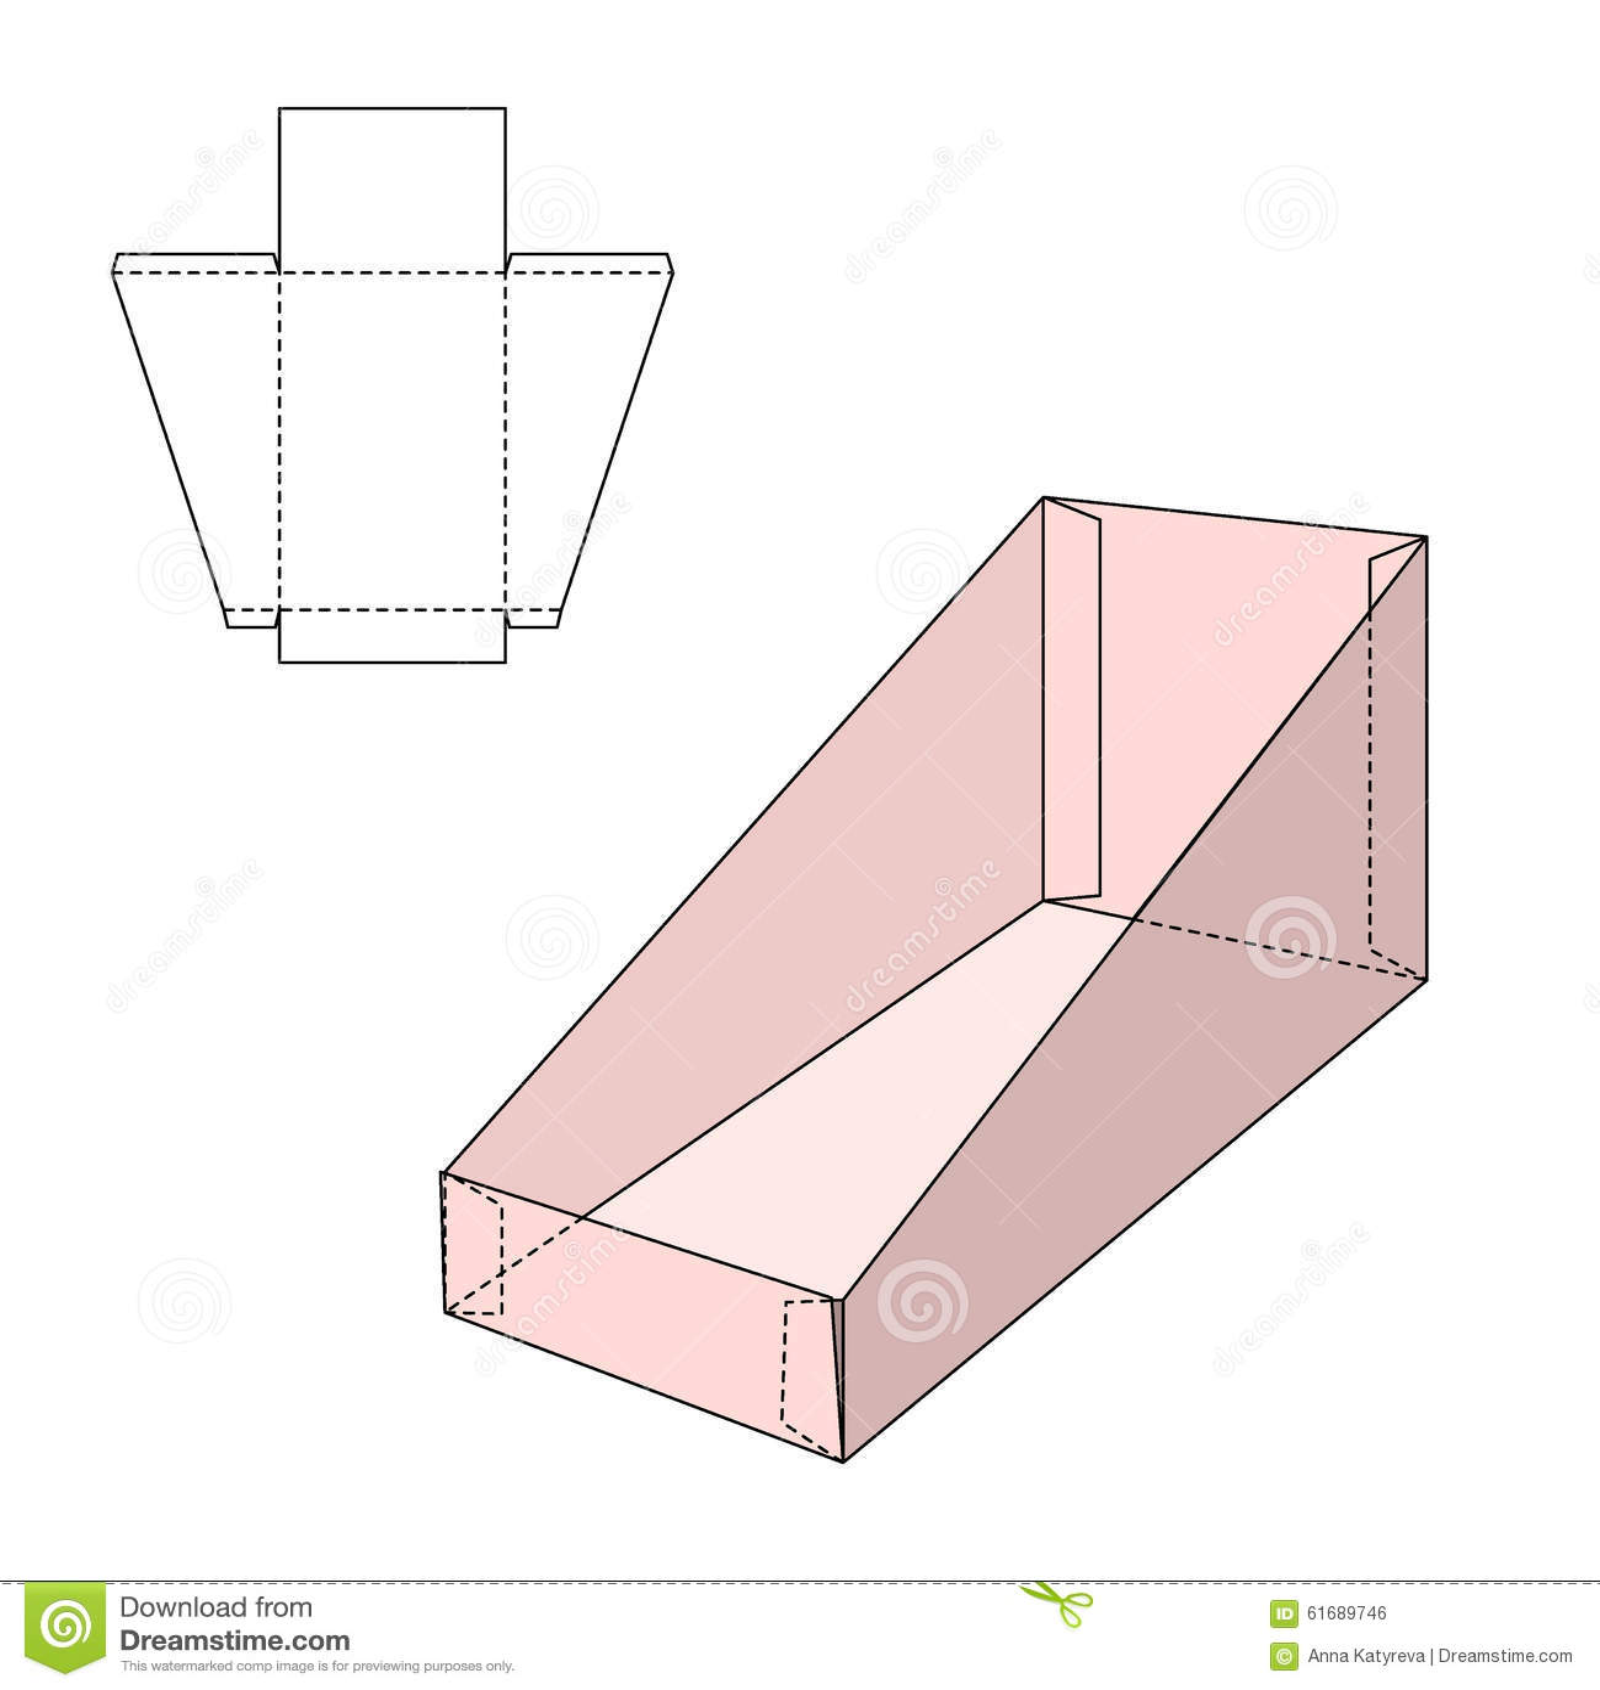 holder box template stock vector illustration of advertisement 61689746. Black Bedroom Furniture Sets. Home Design Ideas